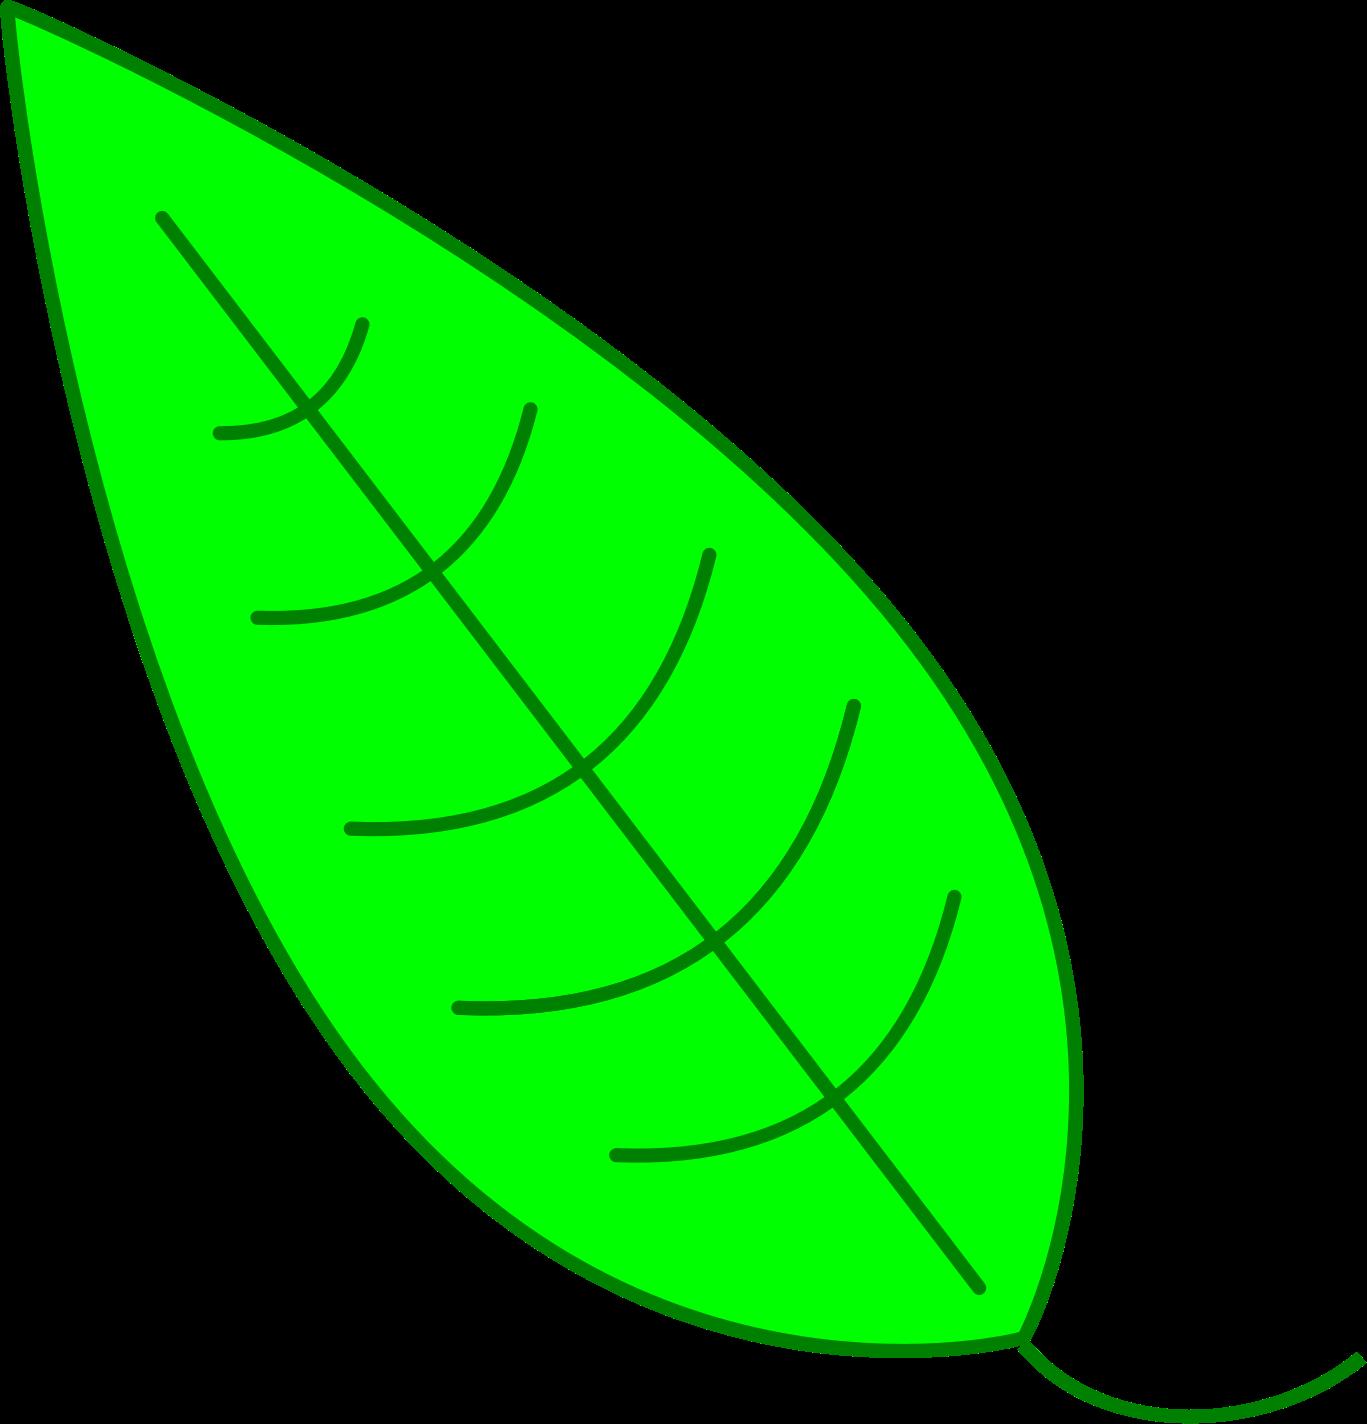 Leaf clipart kid. Green simple big image